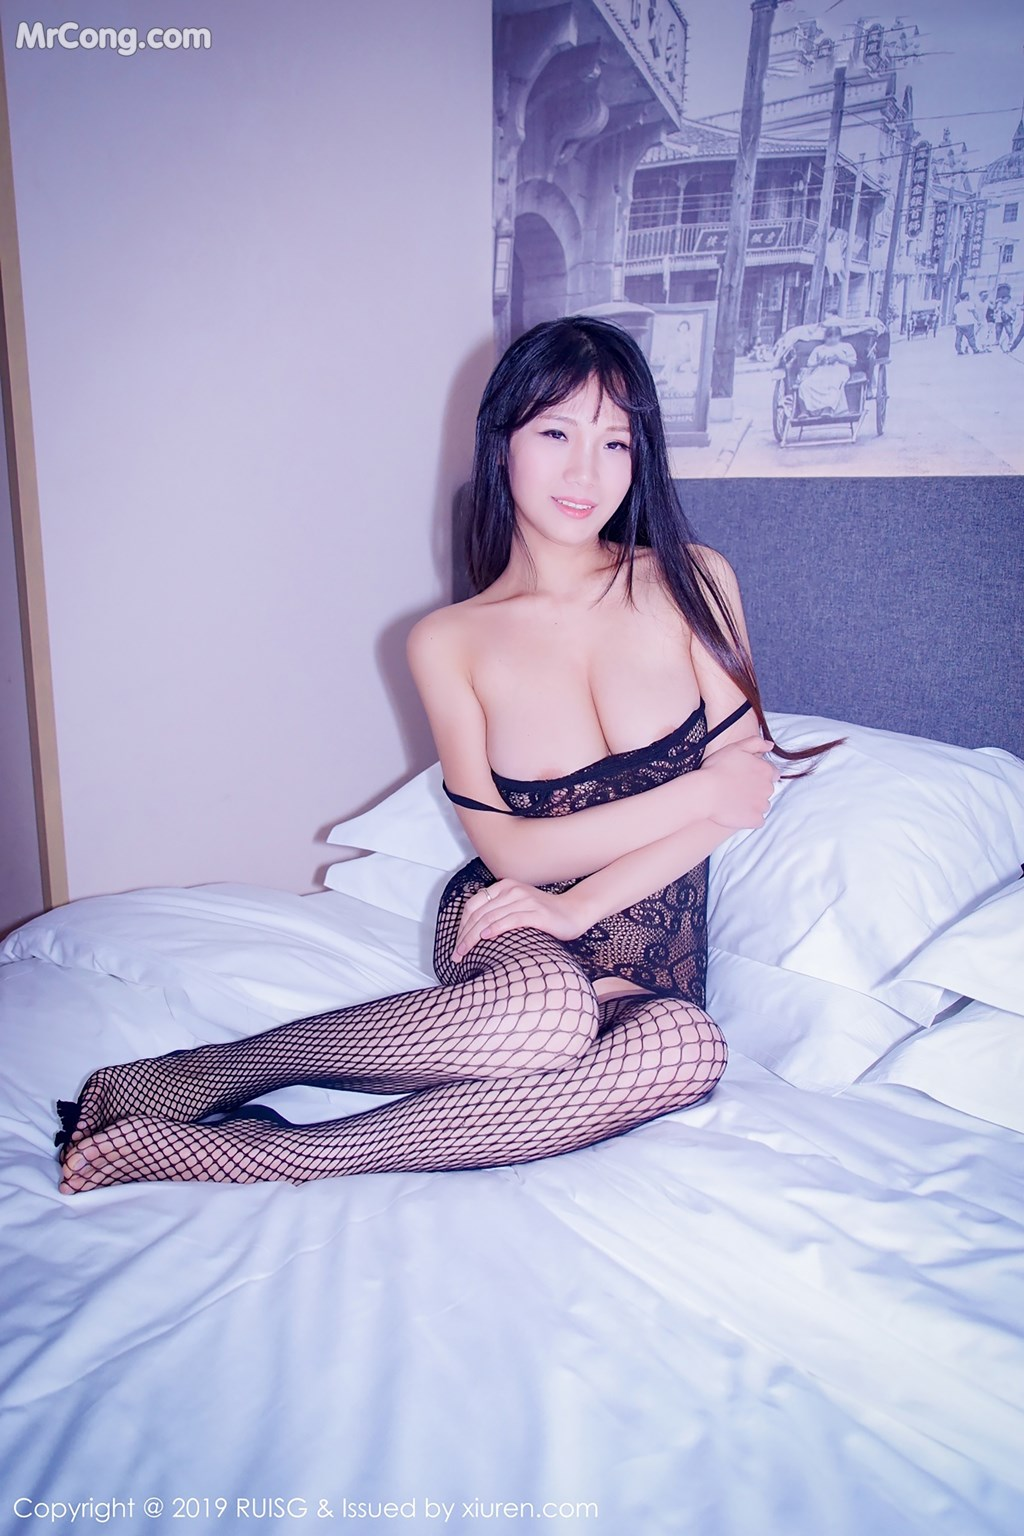 RuiSG Vol.058: Người mẫu Li Ke Ke (李可可) (51 ảnh) - Page 3 of 5